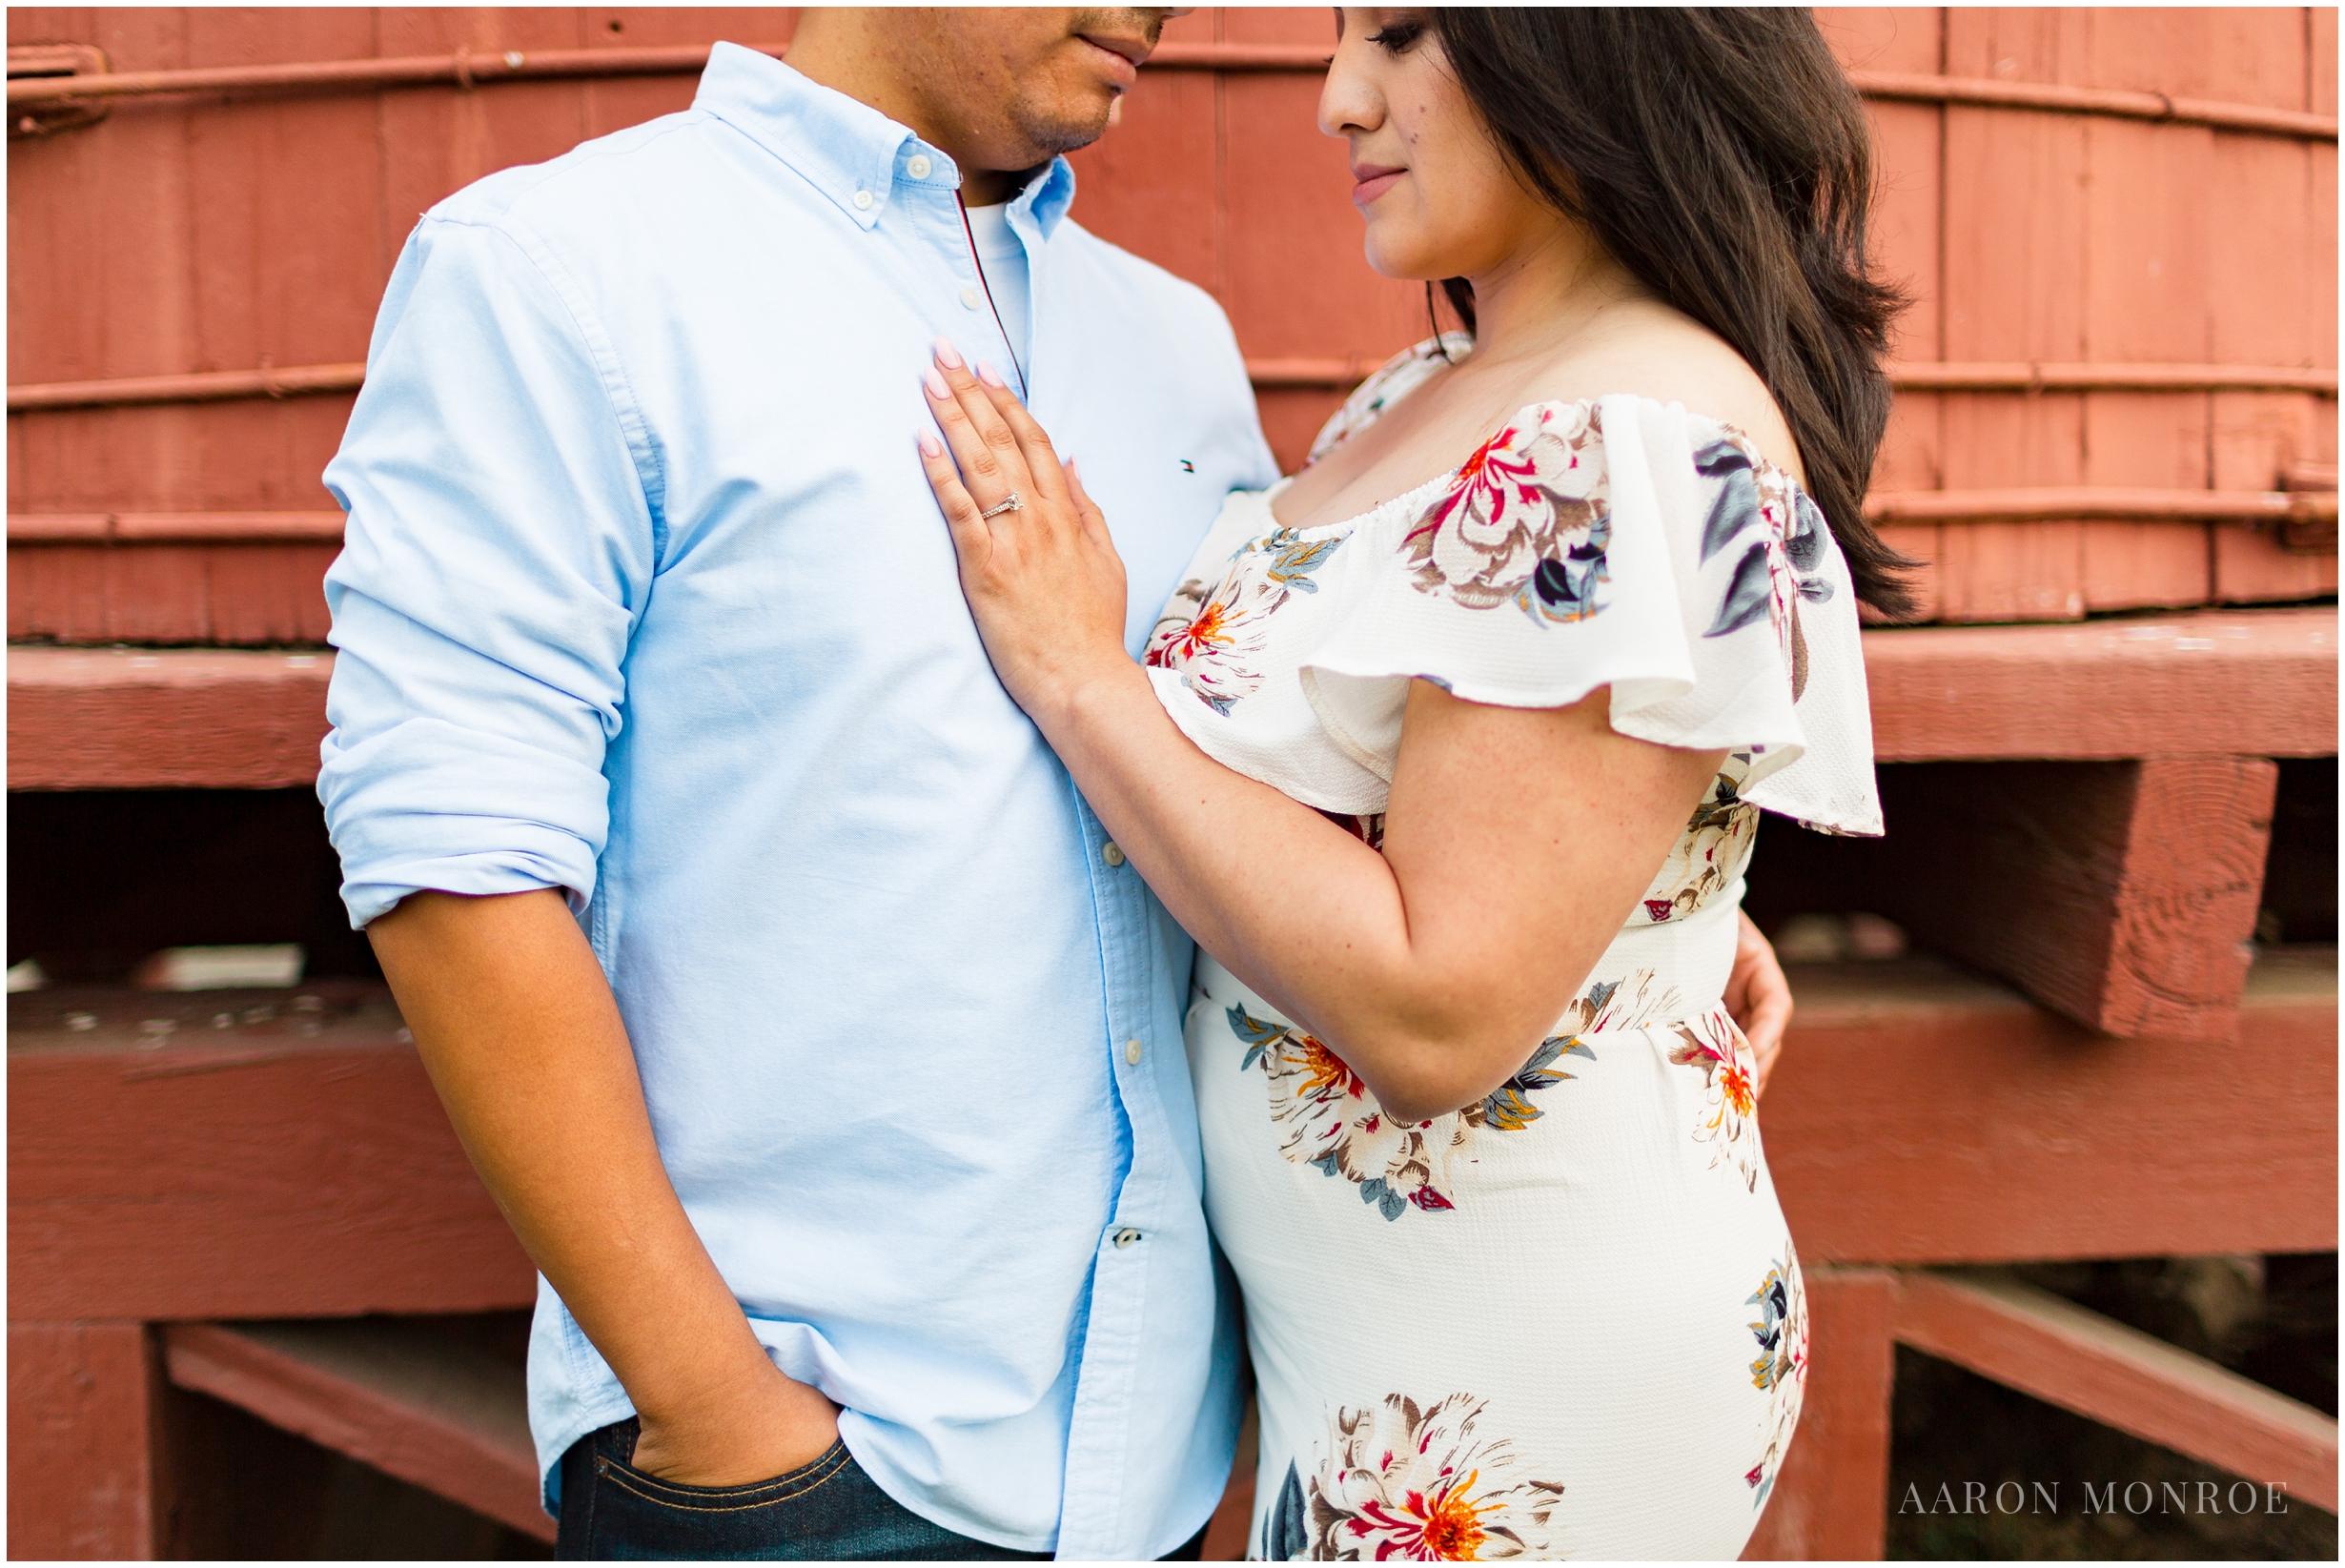 Mission_San_Juan_Capistrano_Engagement_Los_Angeles_Wedding_Photographer_0370.jpg